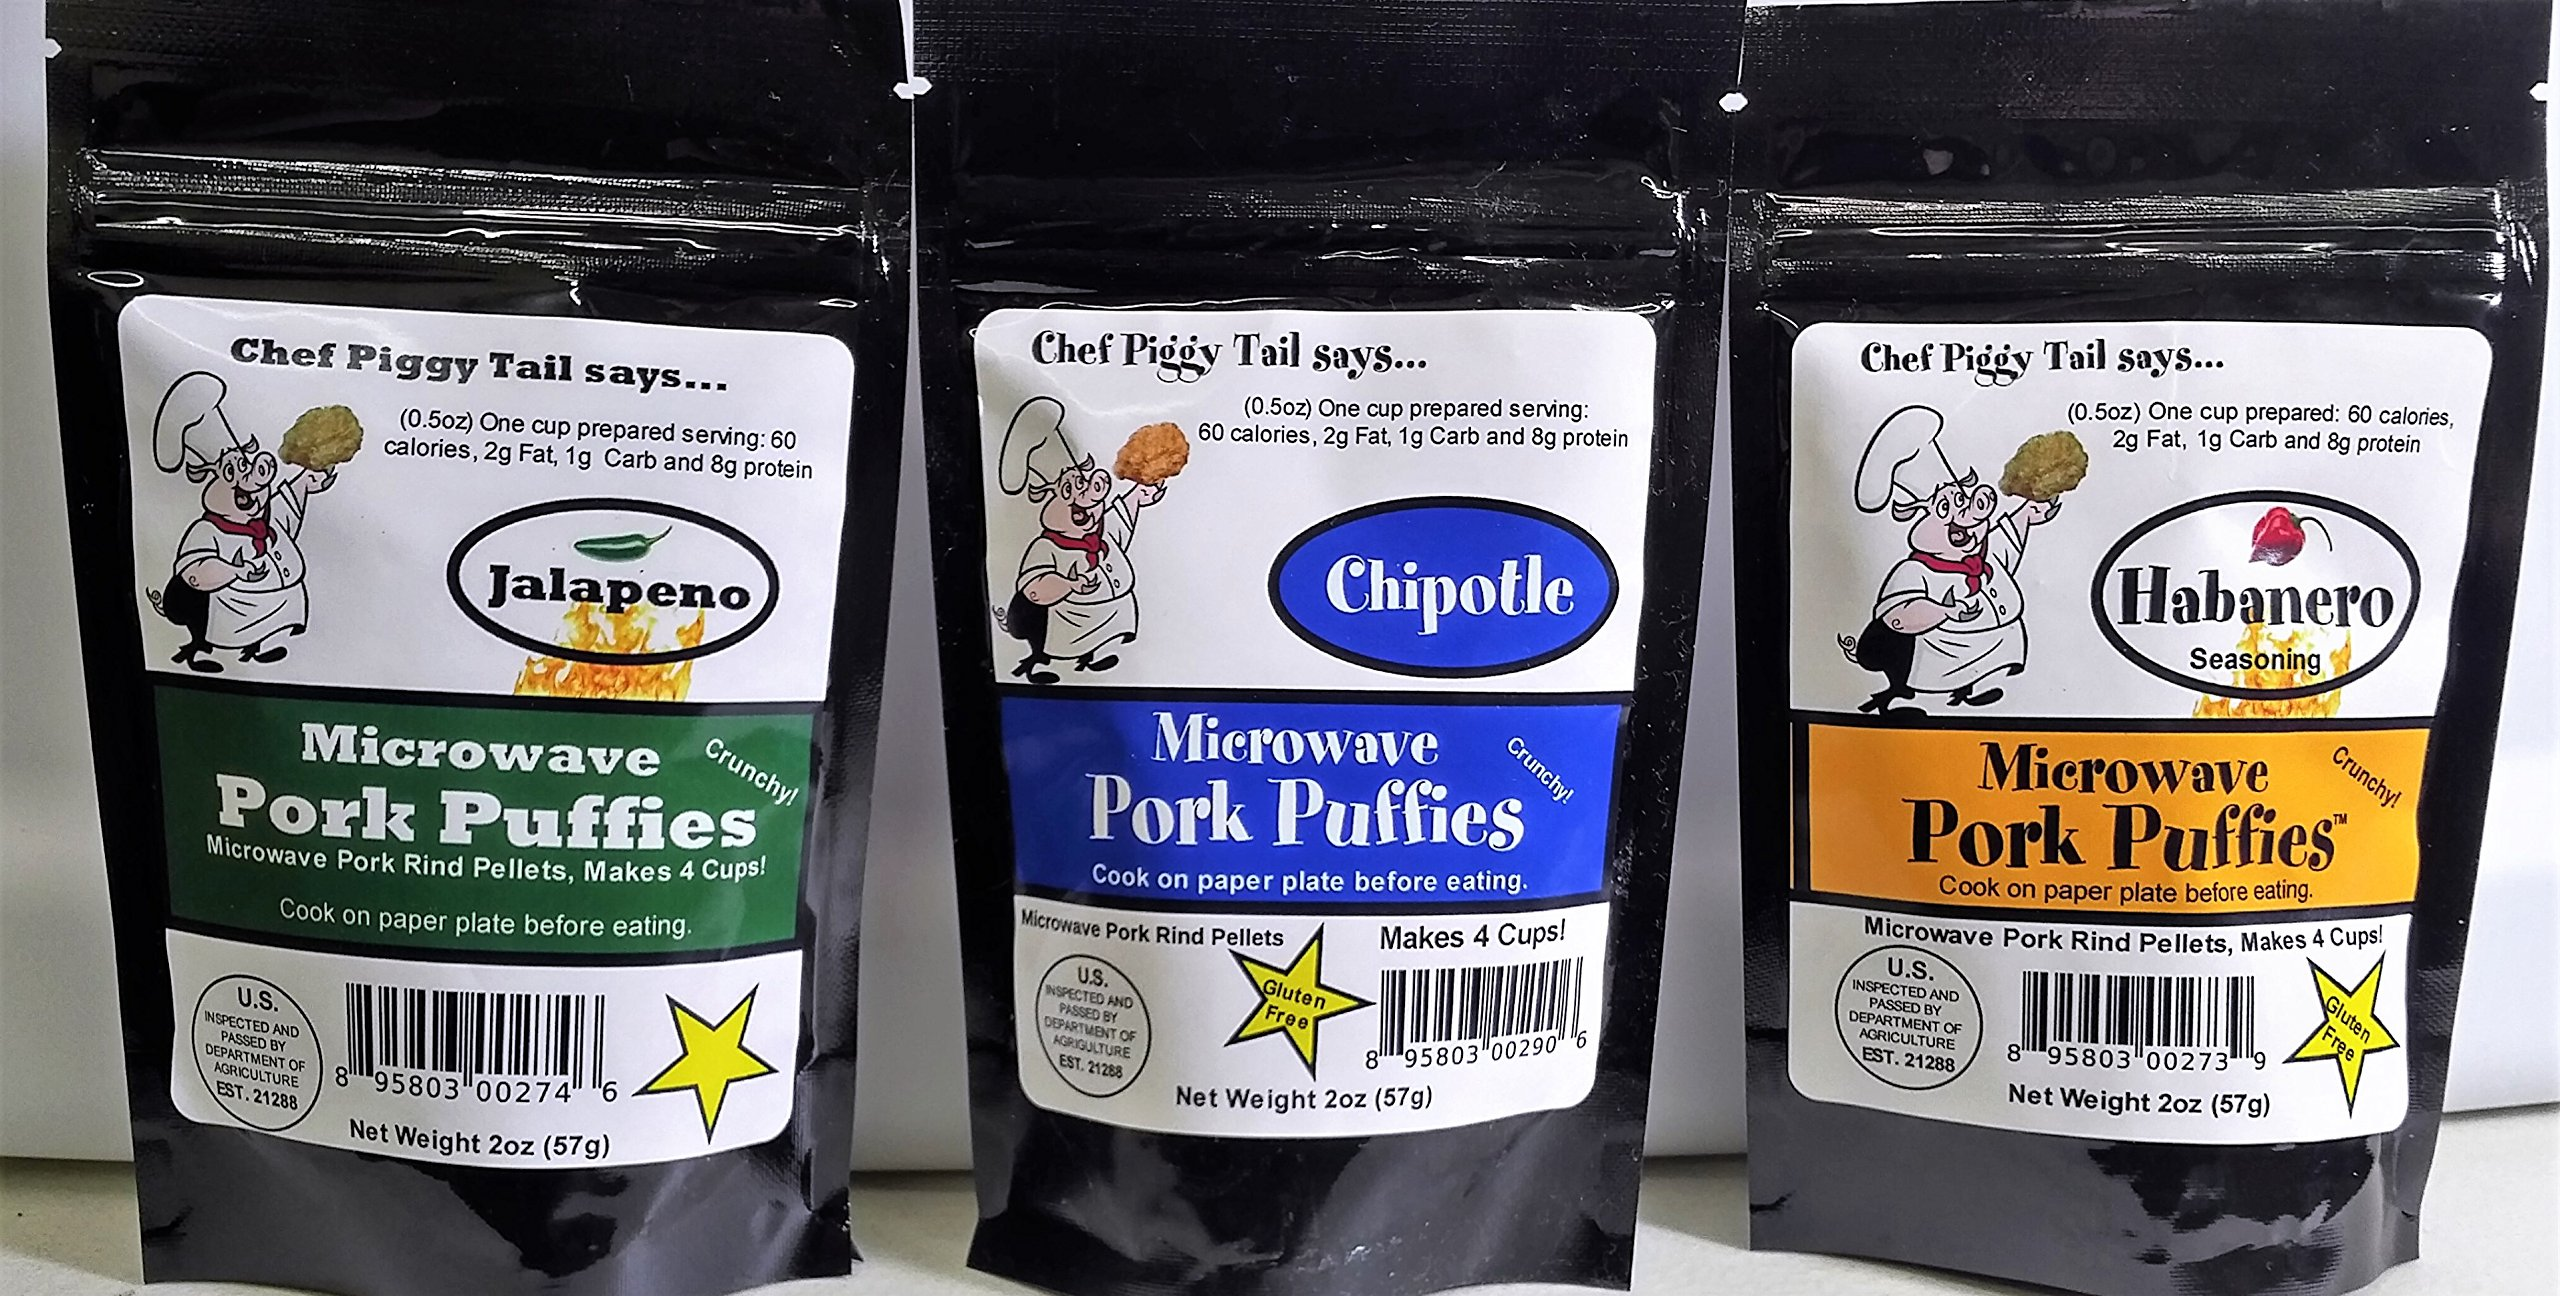 Microwave Pork Rinds HOT HOT HOT 6-pack (2oz Pkgs)